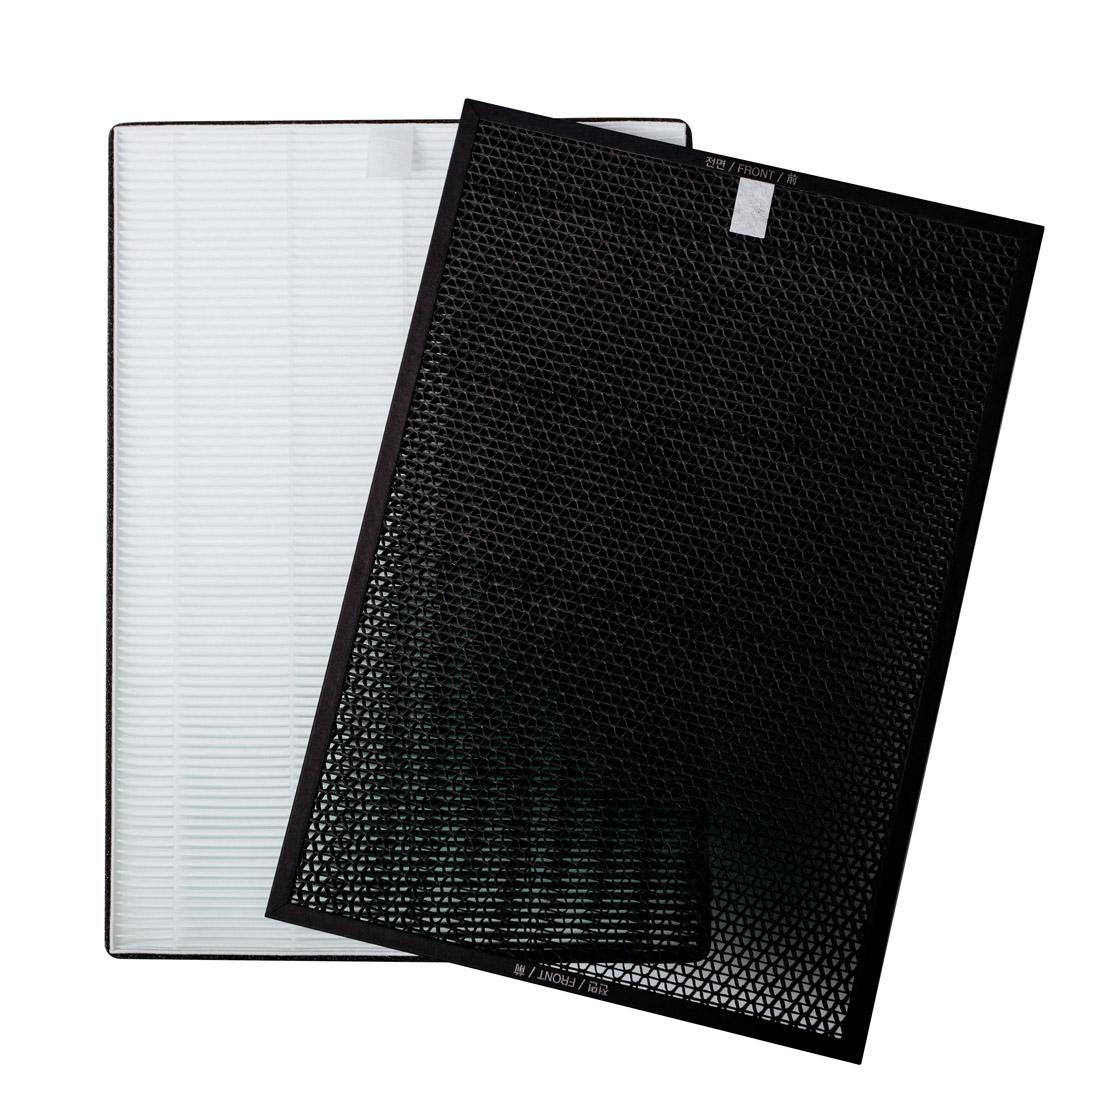 Zestaw filtrów do IDEAL AP 35 / 35 H